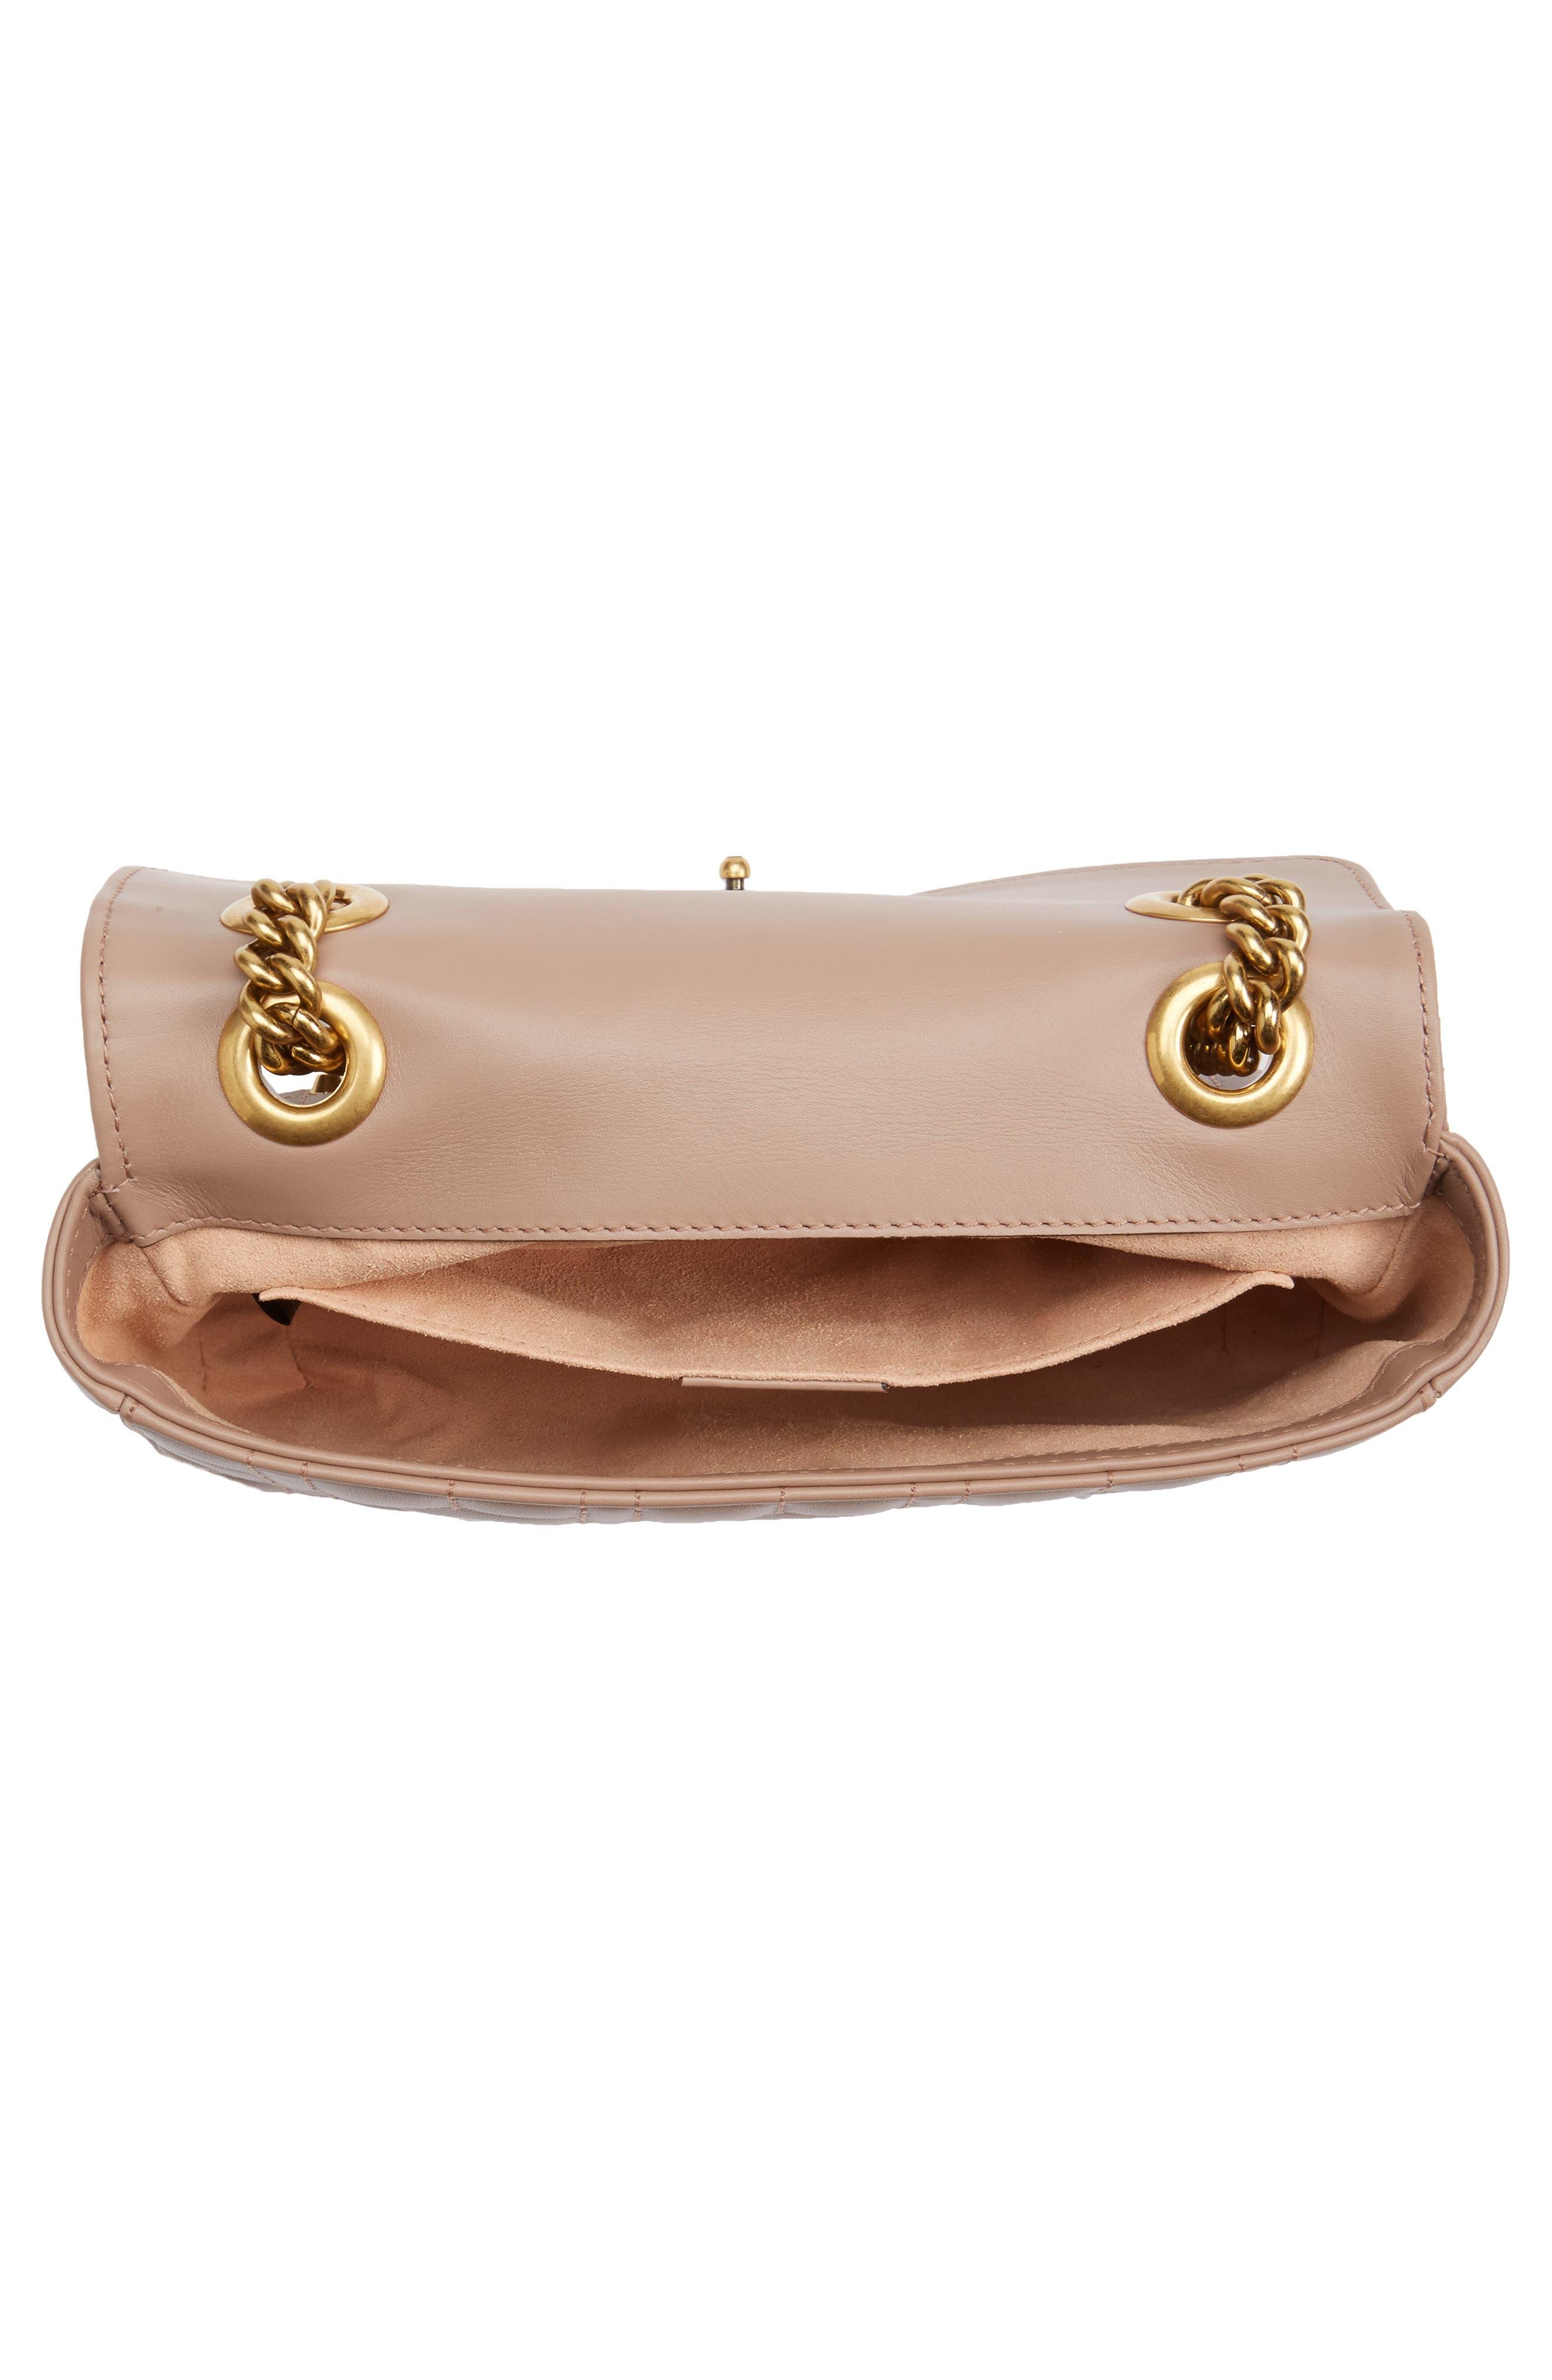 GUCCI, Mini GG Marmont 2.0 Imitation Pearl Logo Matelassé Leather Shoulder Bag, Alternate thumbnail 4, color, 651